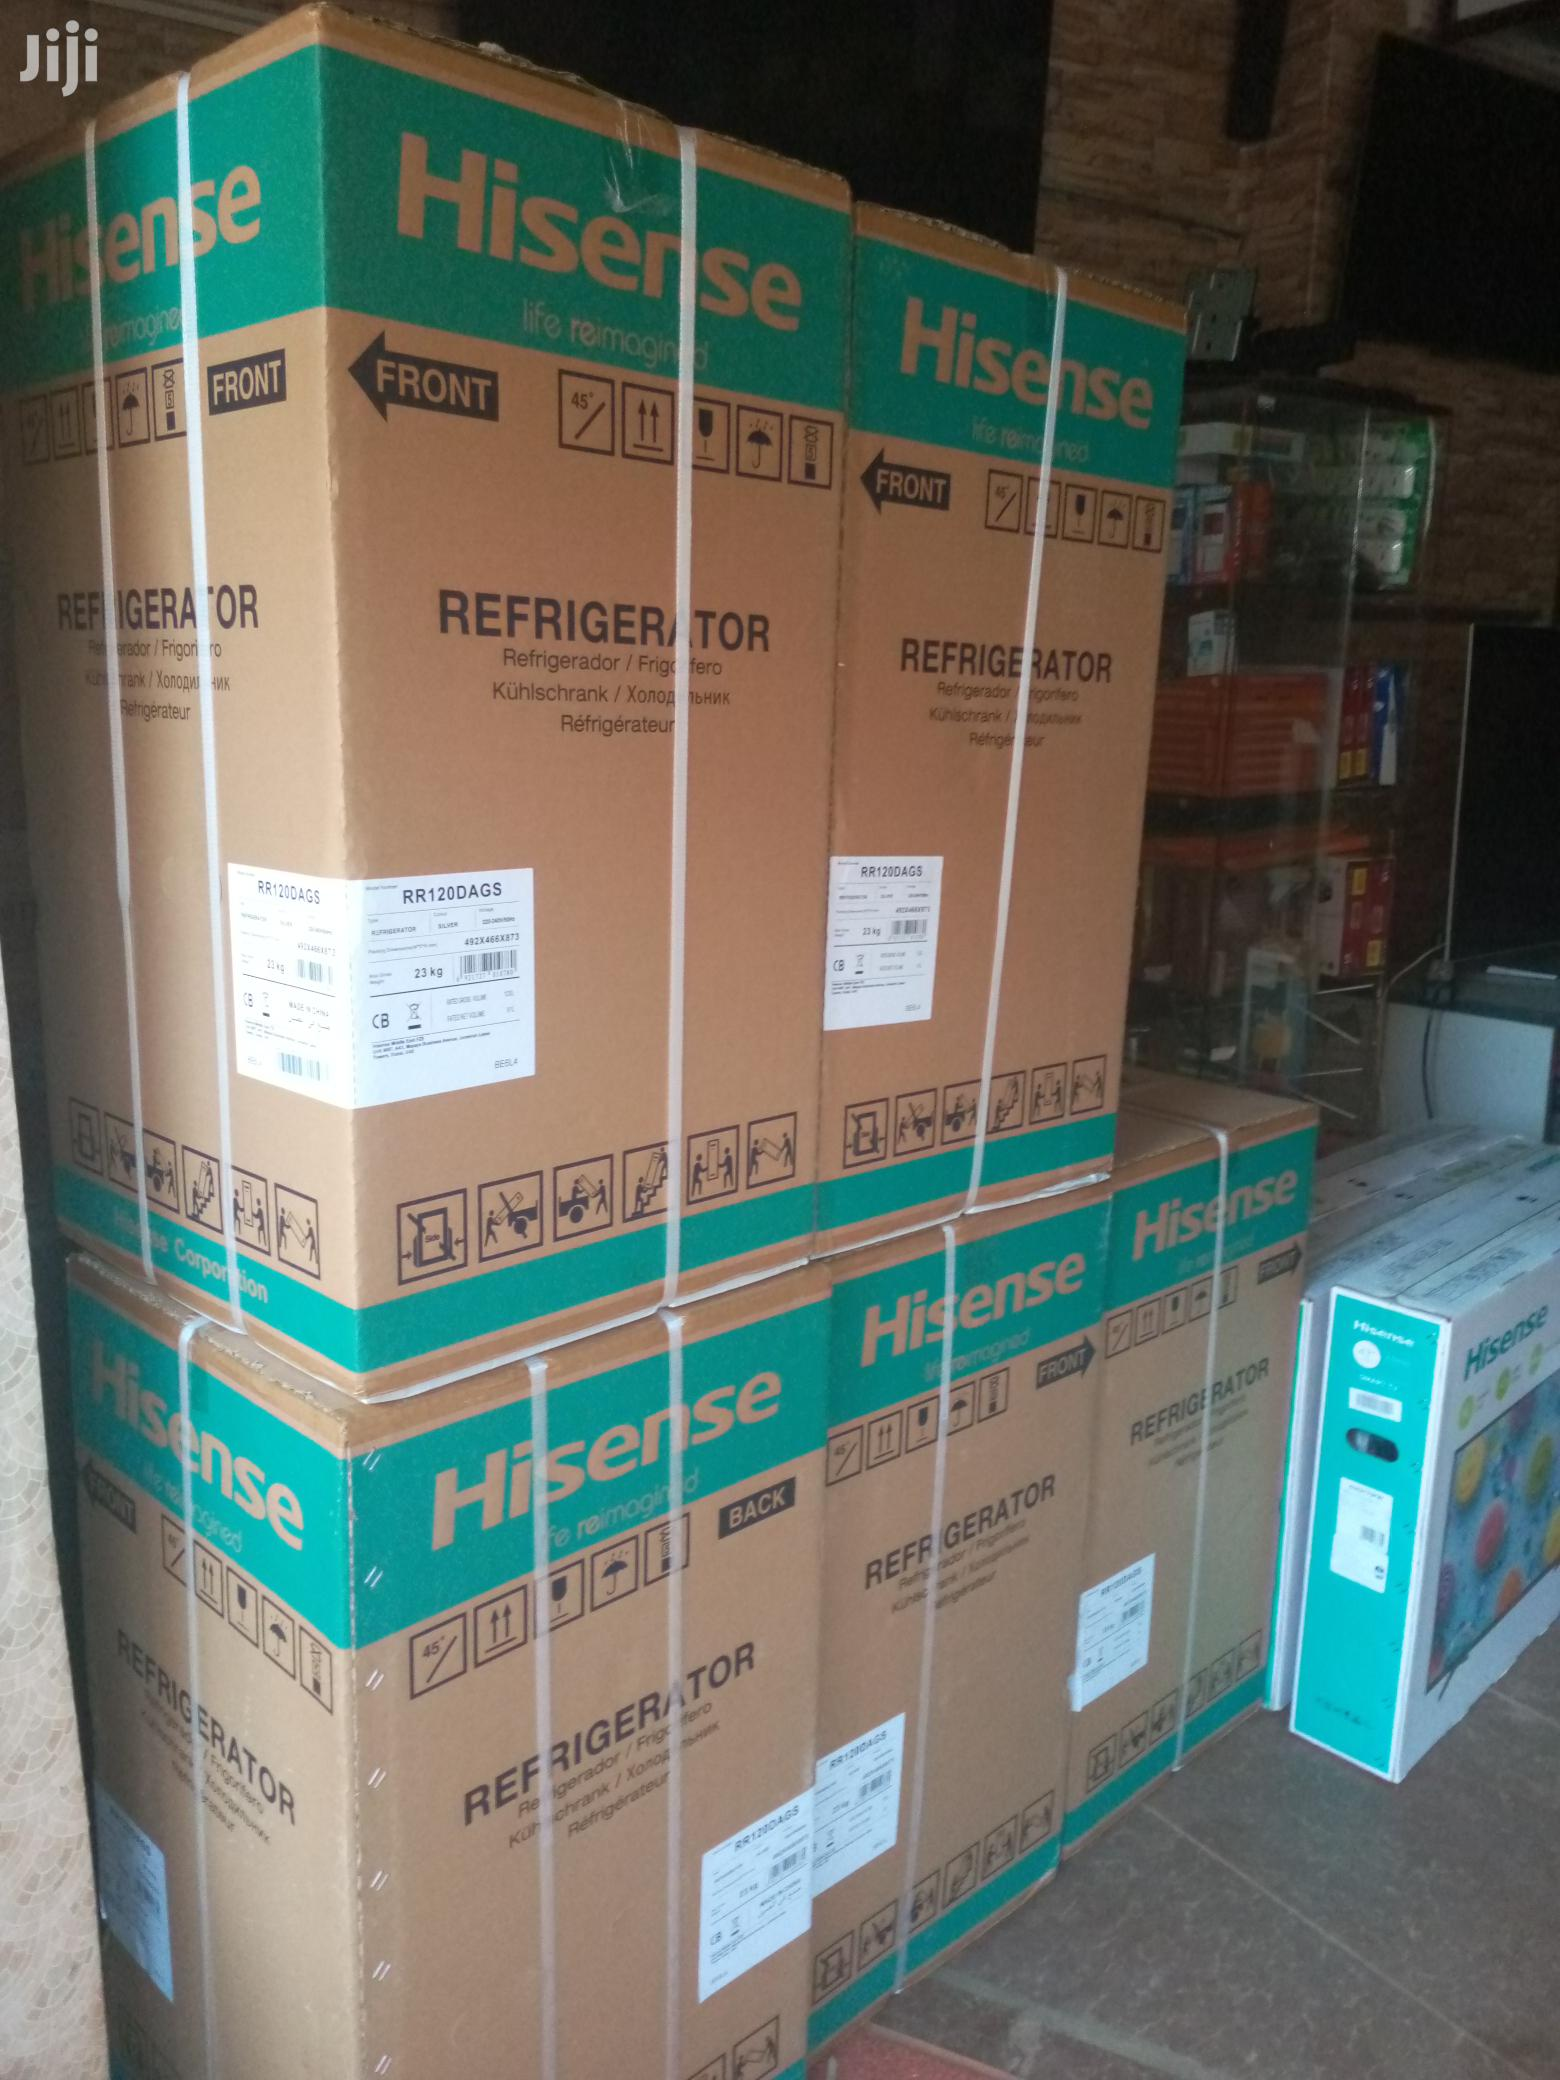 120 Litres Refrigirator On Sale